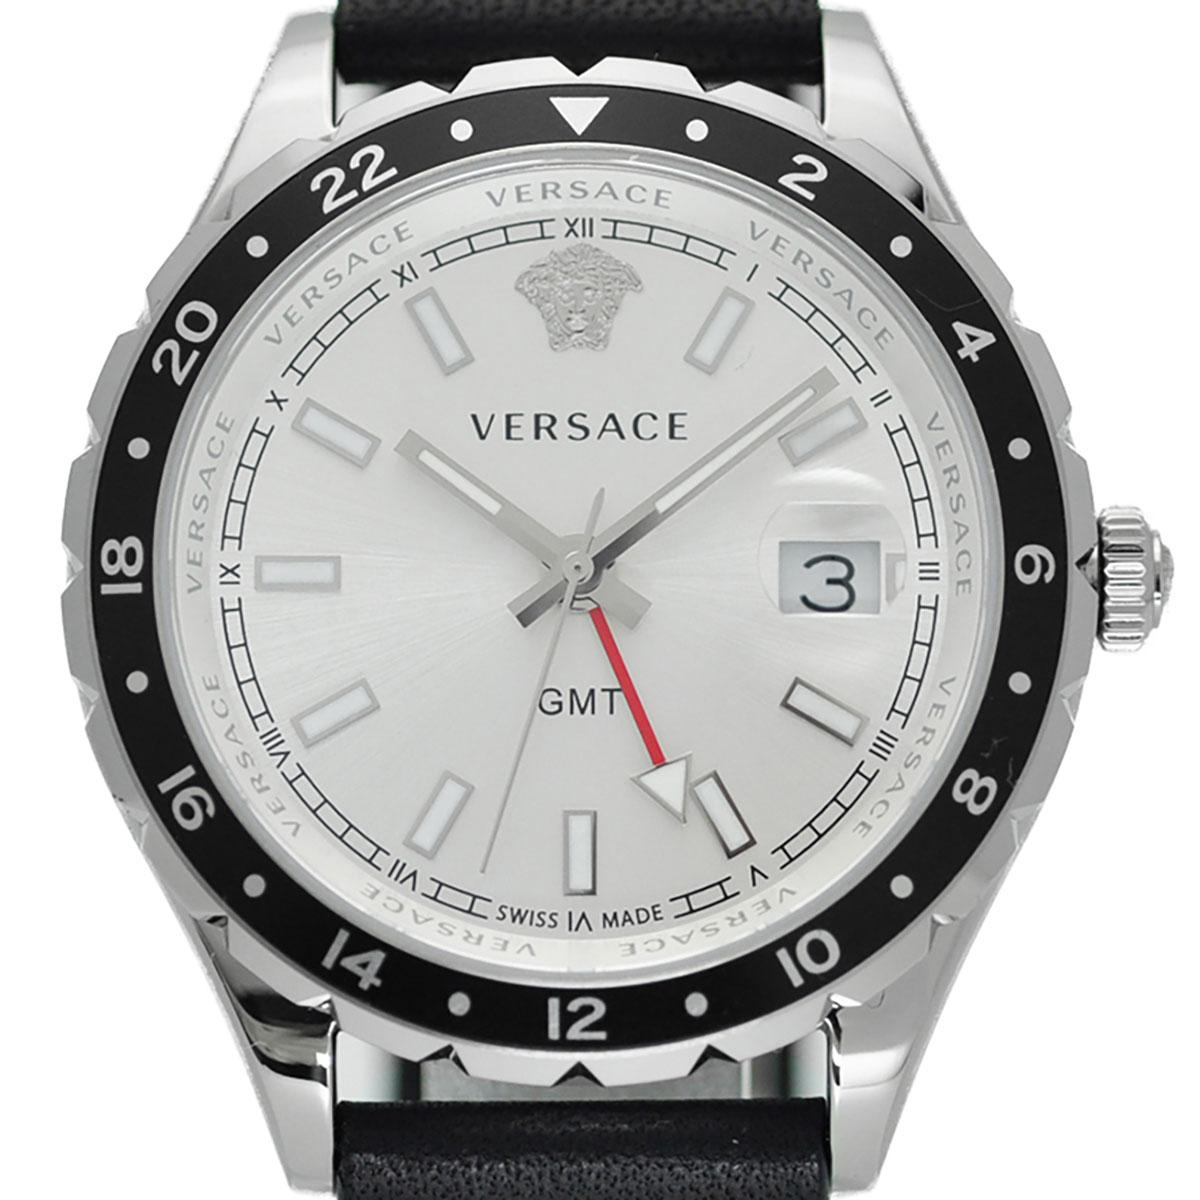 Versace ヴェルサーチ 電池式クォーツ 腕時計 [V11070017] 並行輸入品  デイト カレンダー GMT(ワールドタイム)